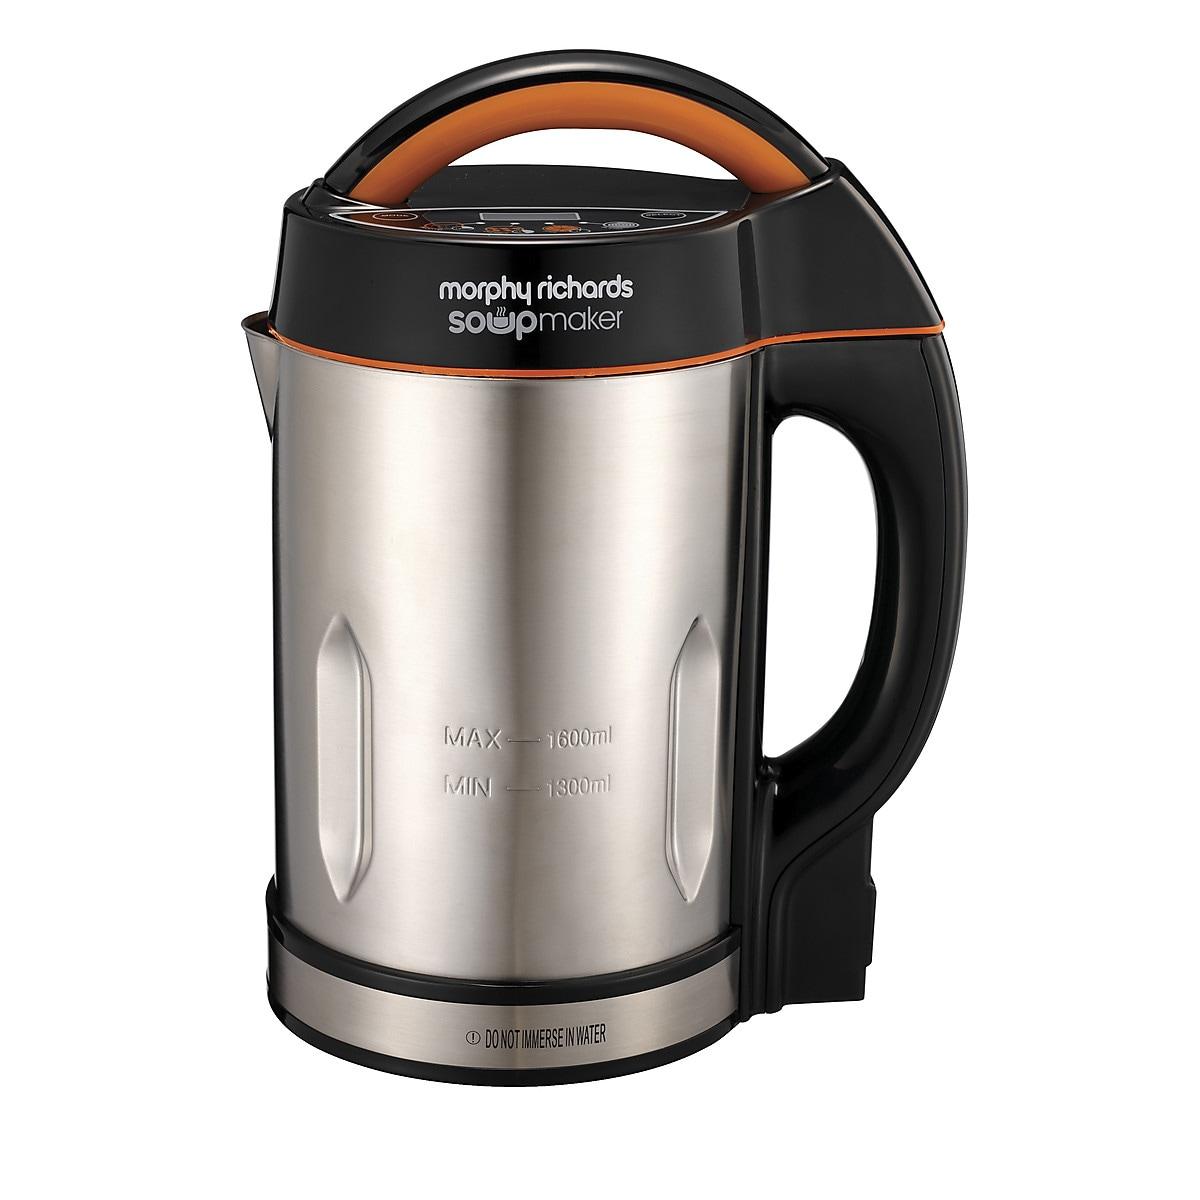 Morphy Richards 48822 Soup maker